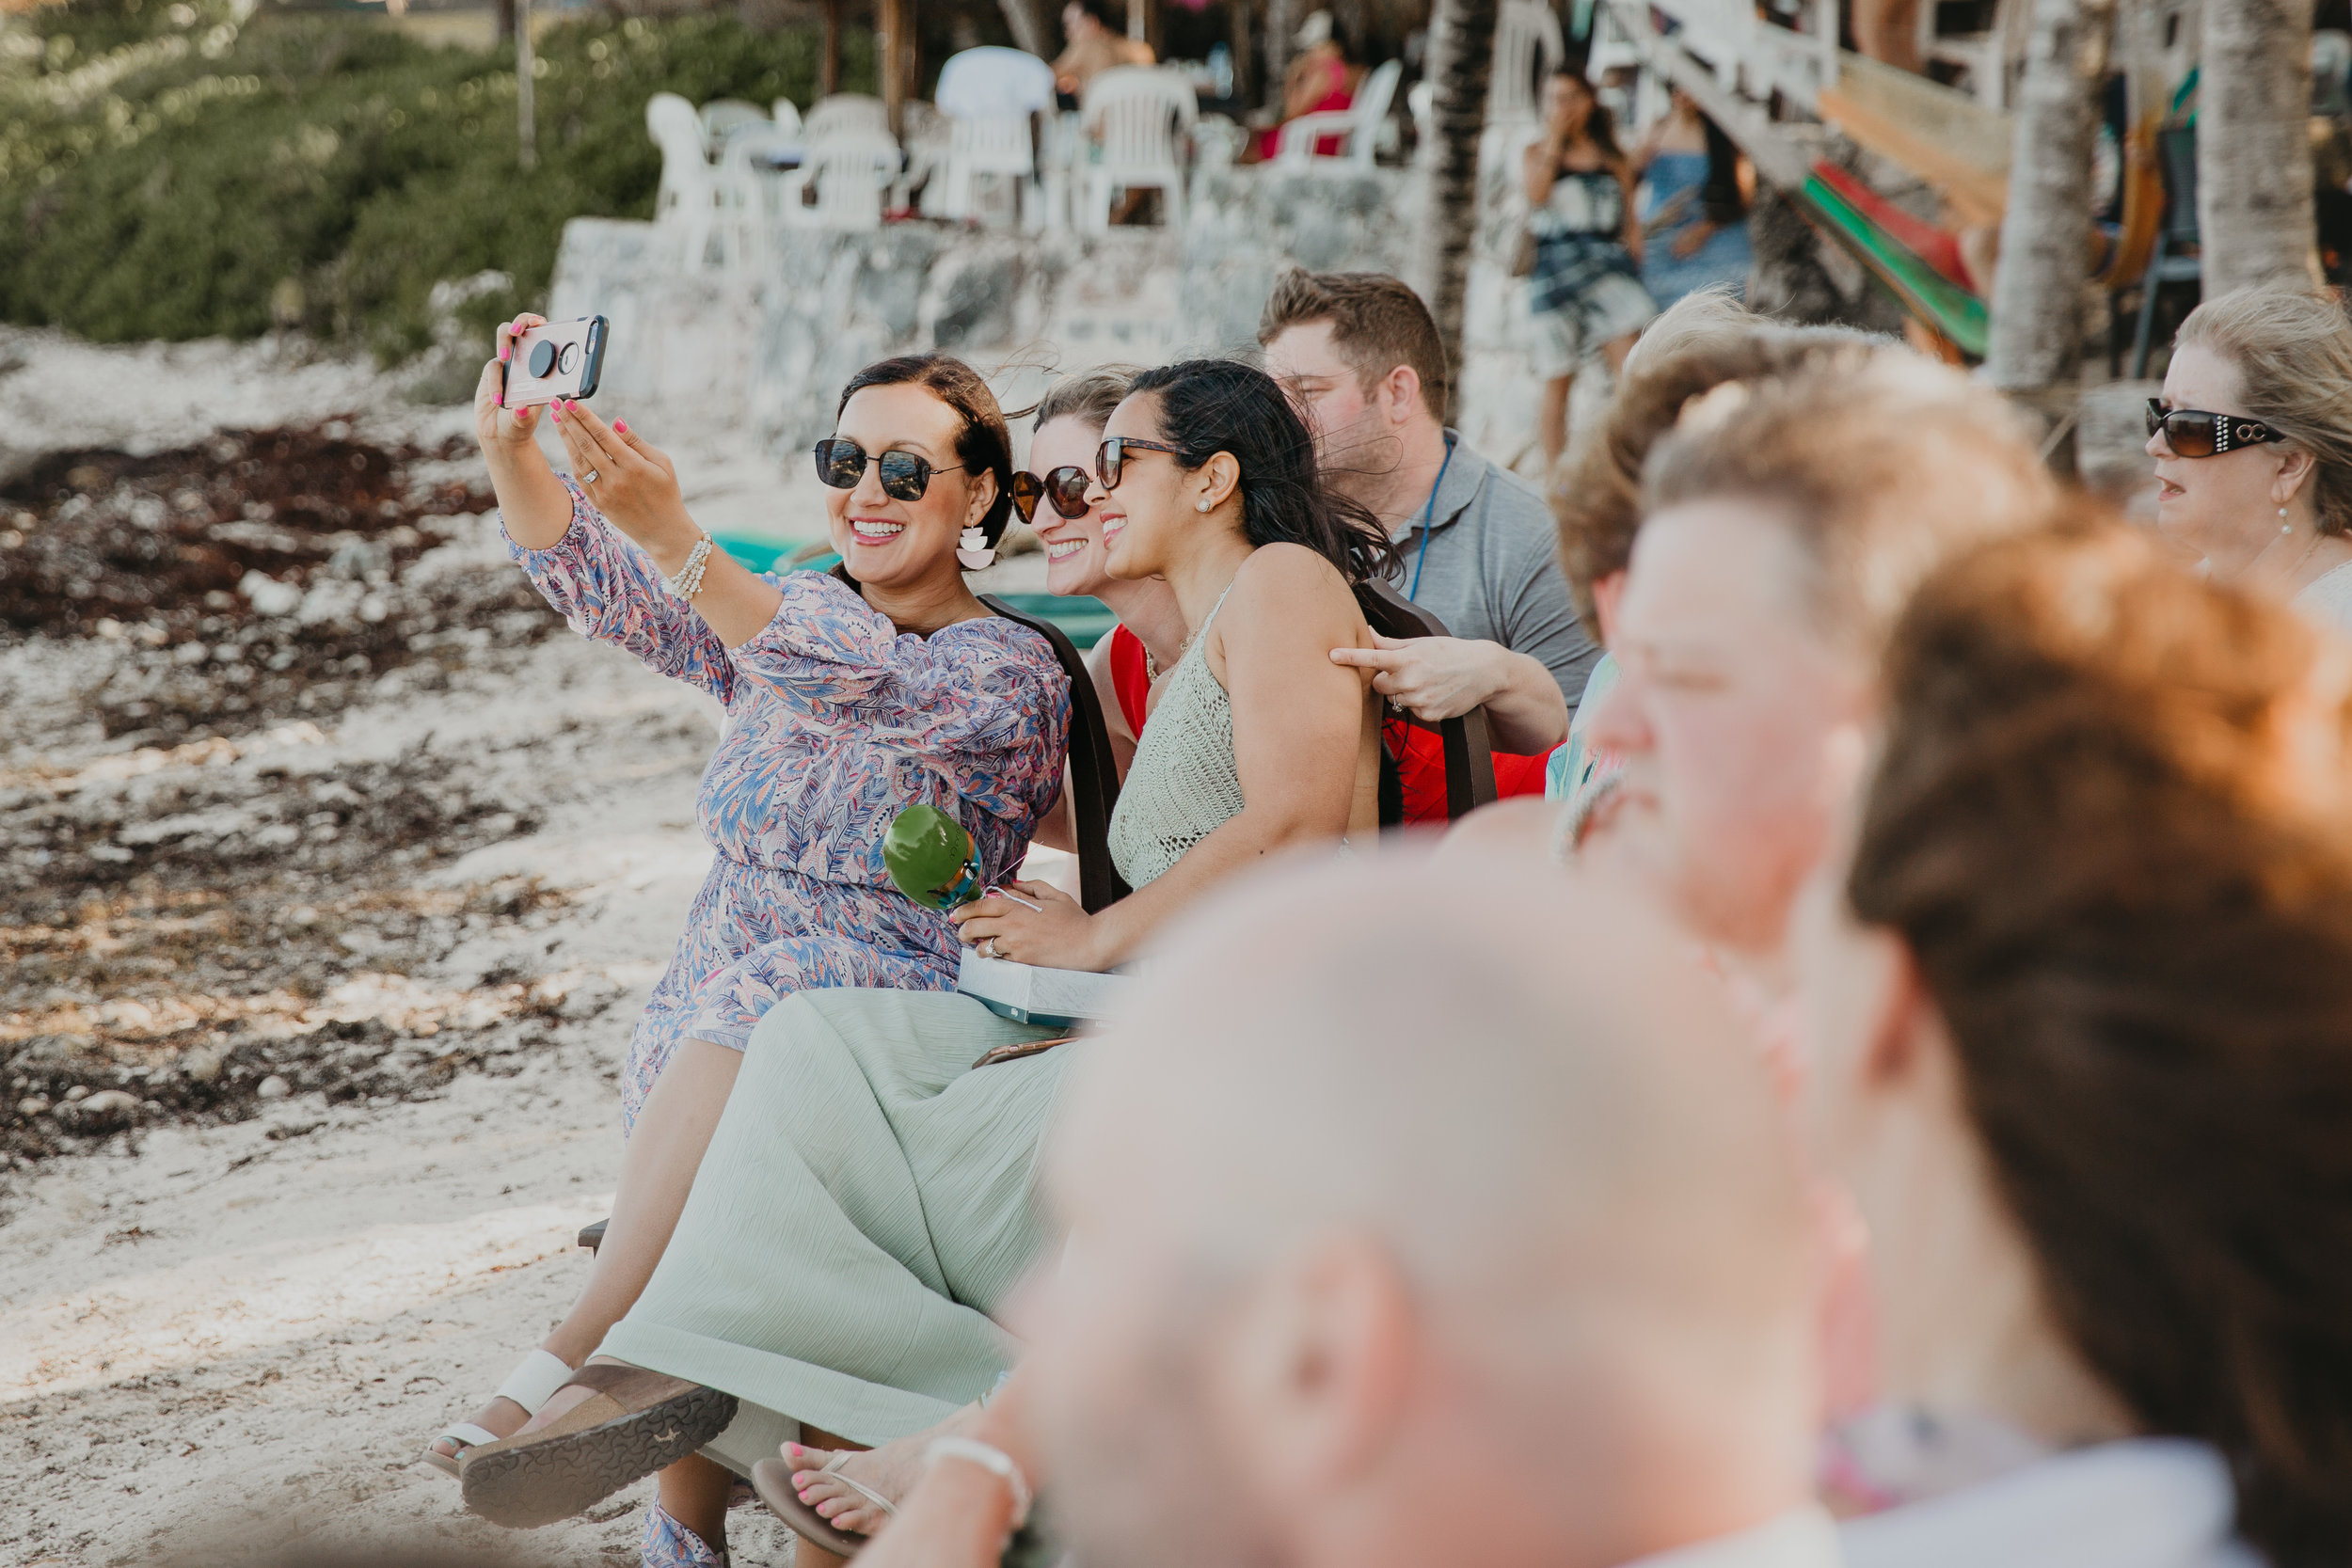 Nicole-Daacke-Photography-beachfront-akumal-destionation-wedding-tulum-mexico-elopement-photographer-destination-wedding-inspiration-sunset-champagne-pop-boho-bride-ocean-tropical-bohemian-tulum-wedding-photos-151.jpg